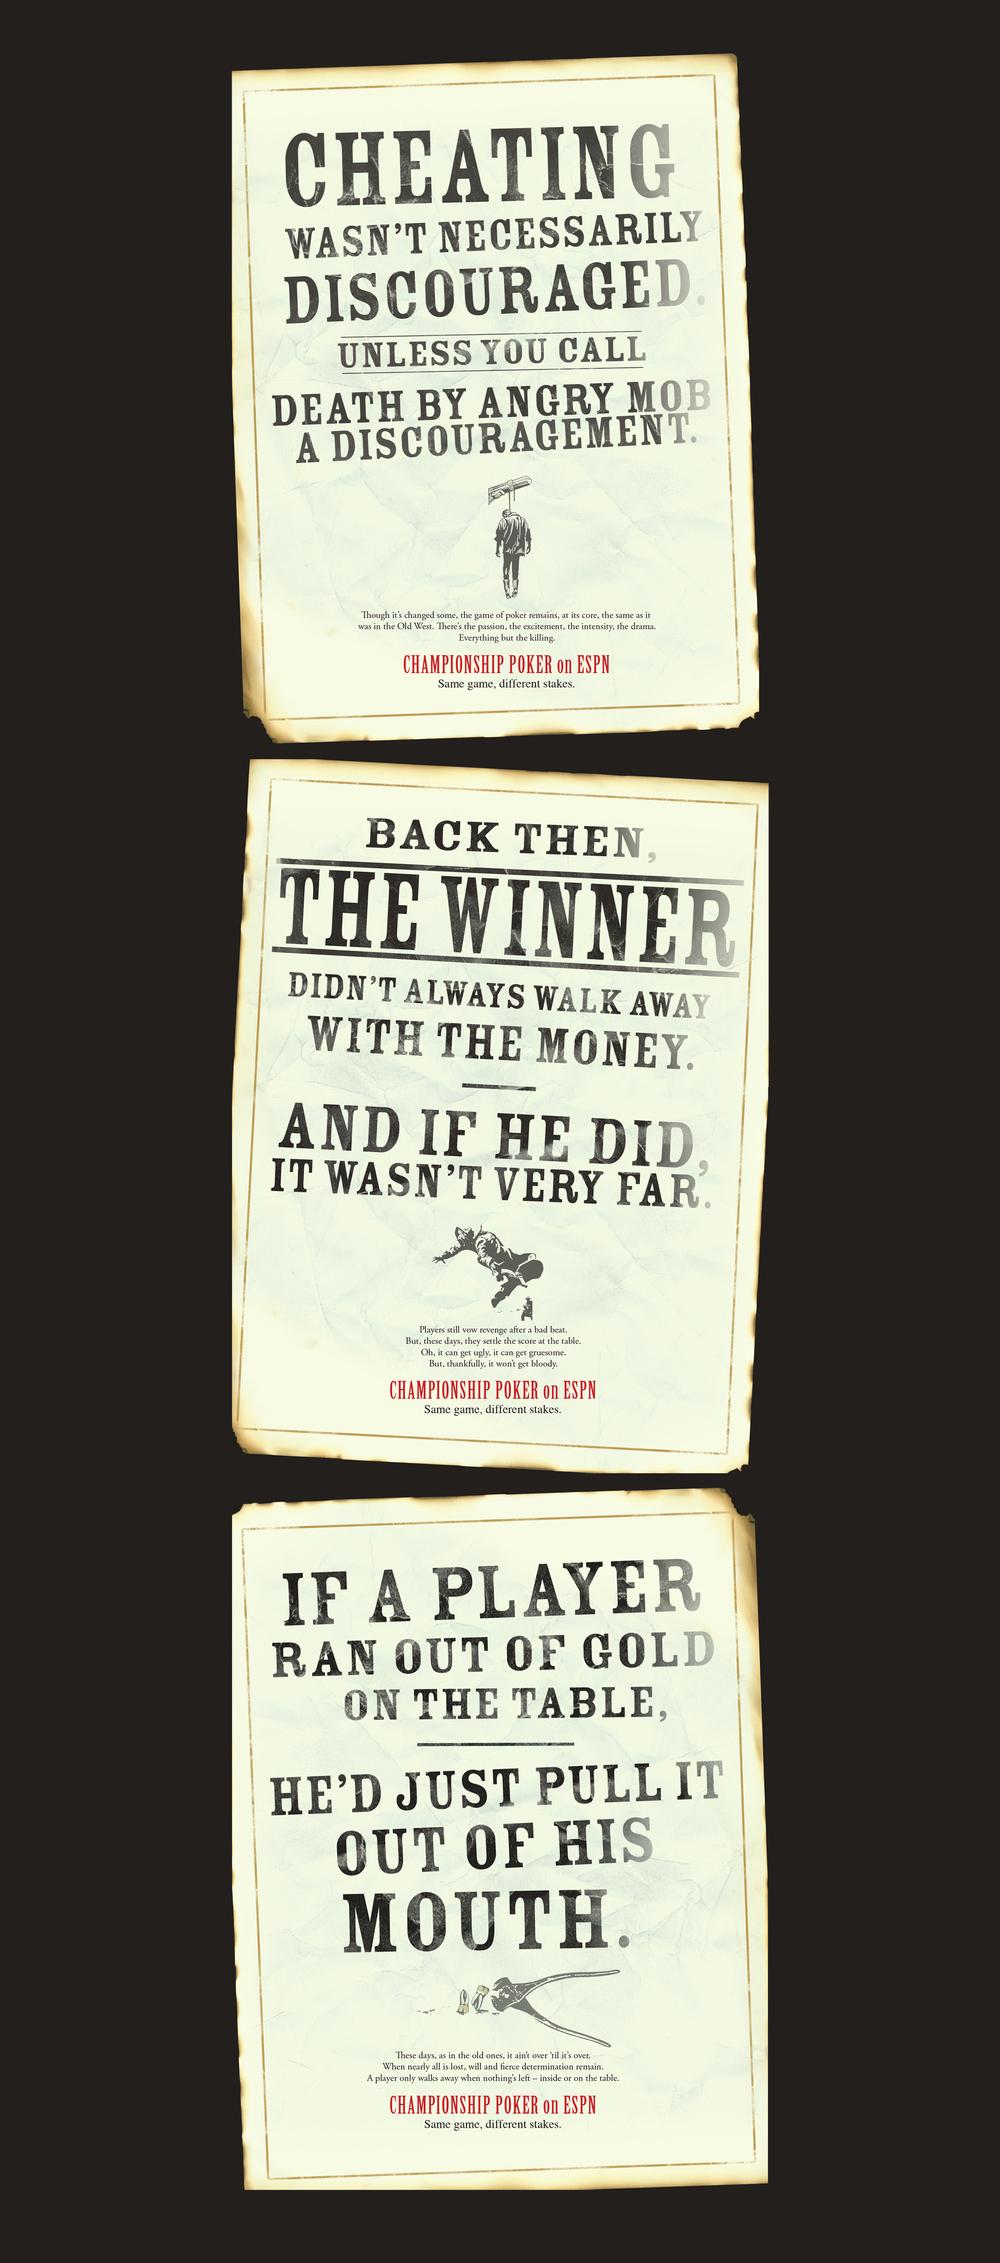 ESPN: Championship Poker Ads